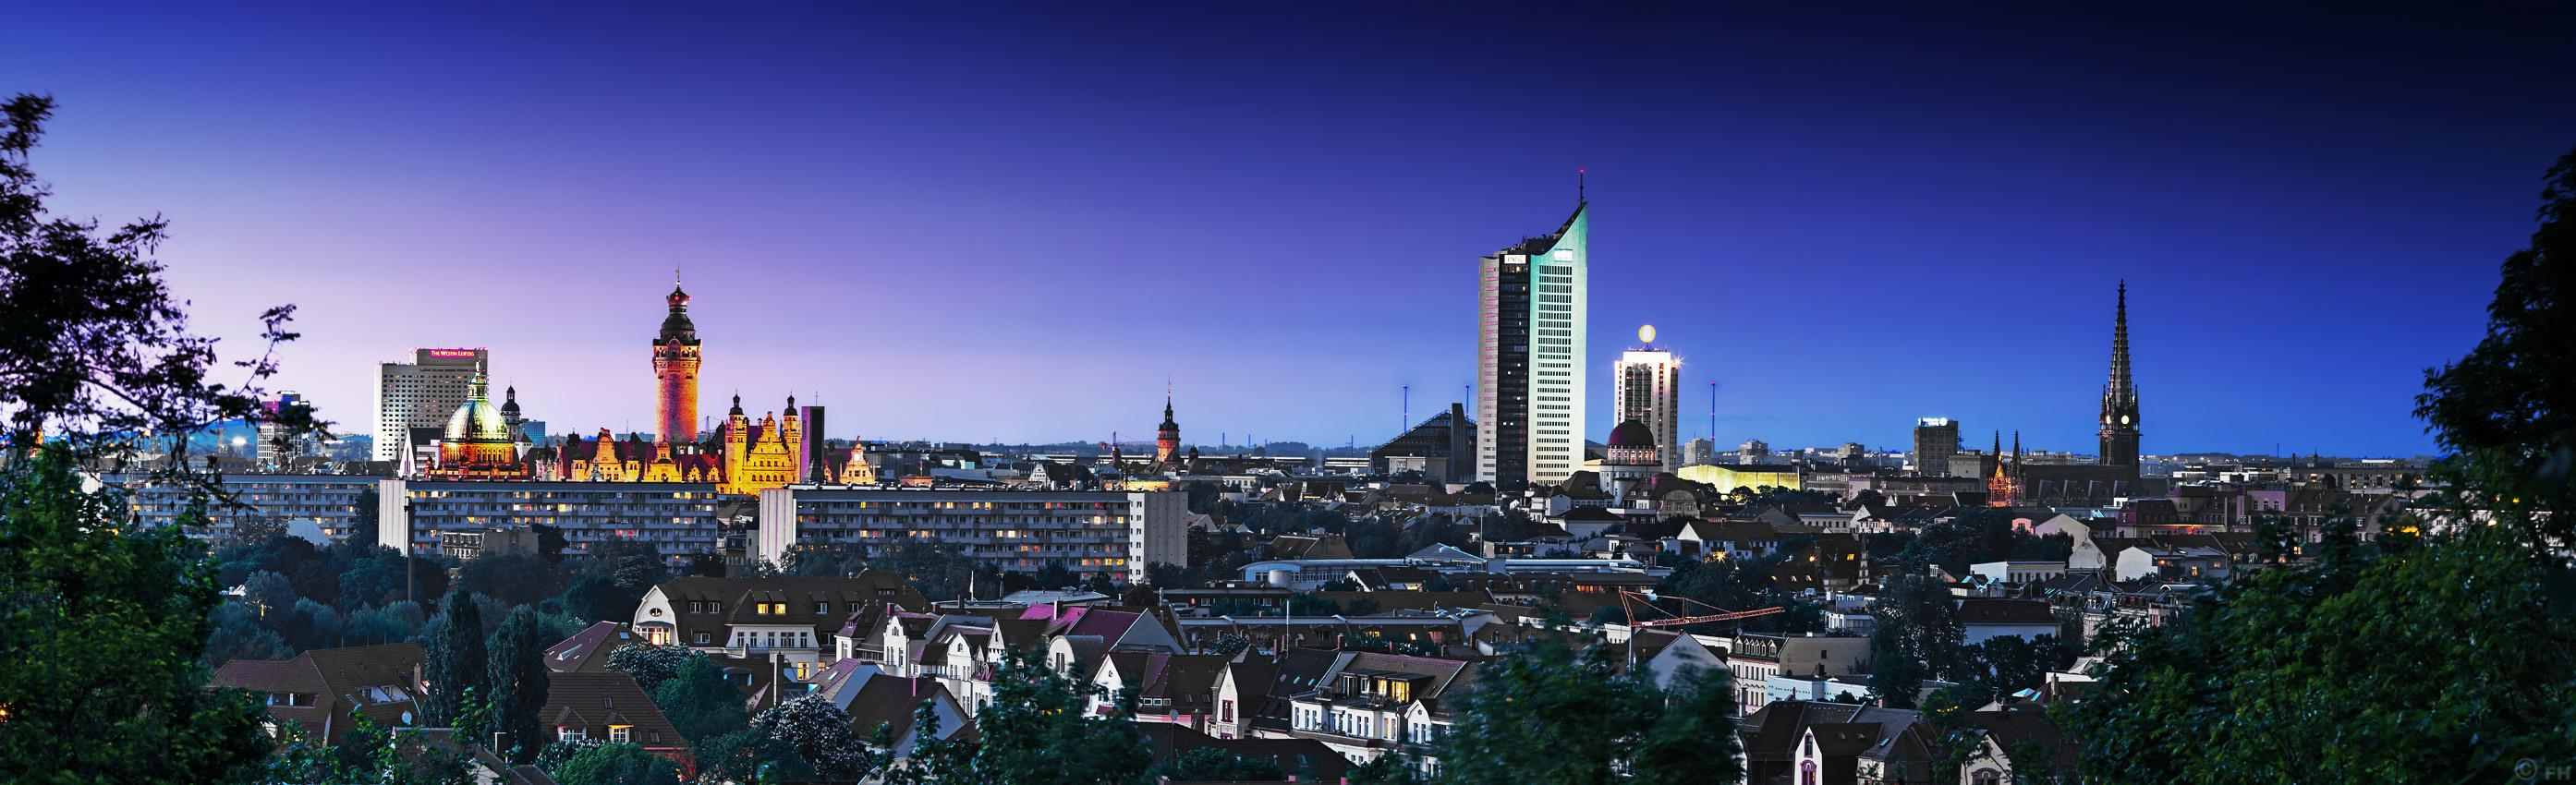 Leipzig_bluehourpano_k1